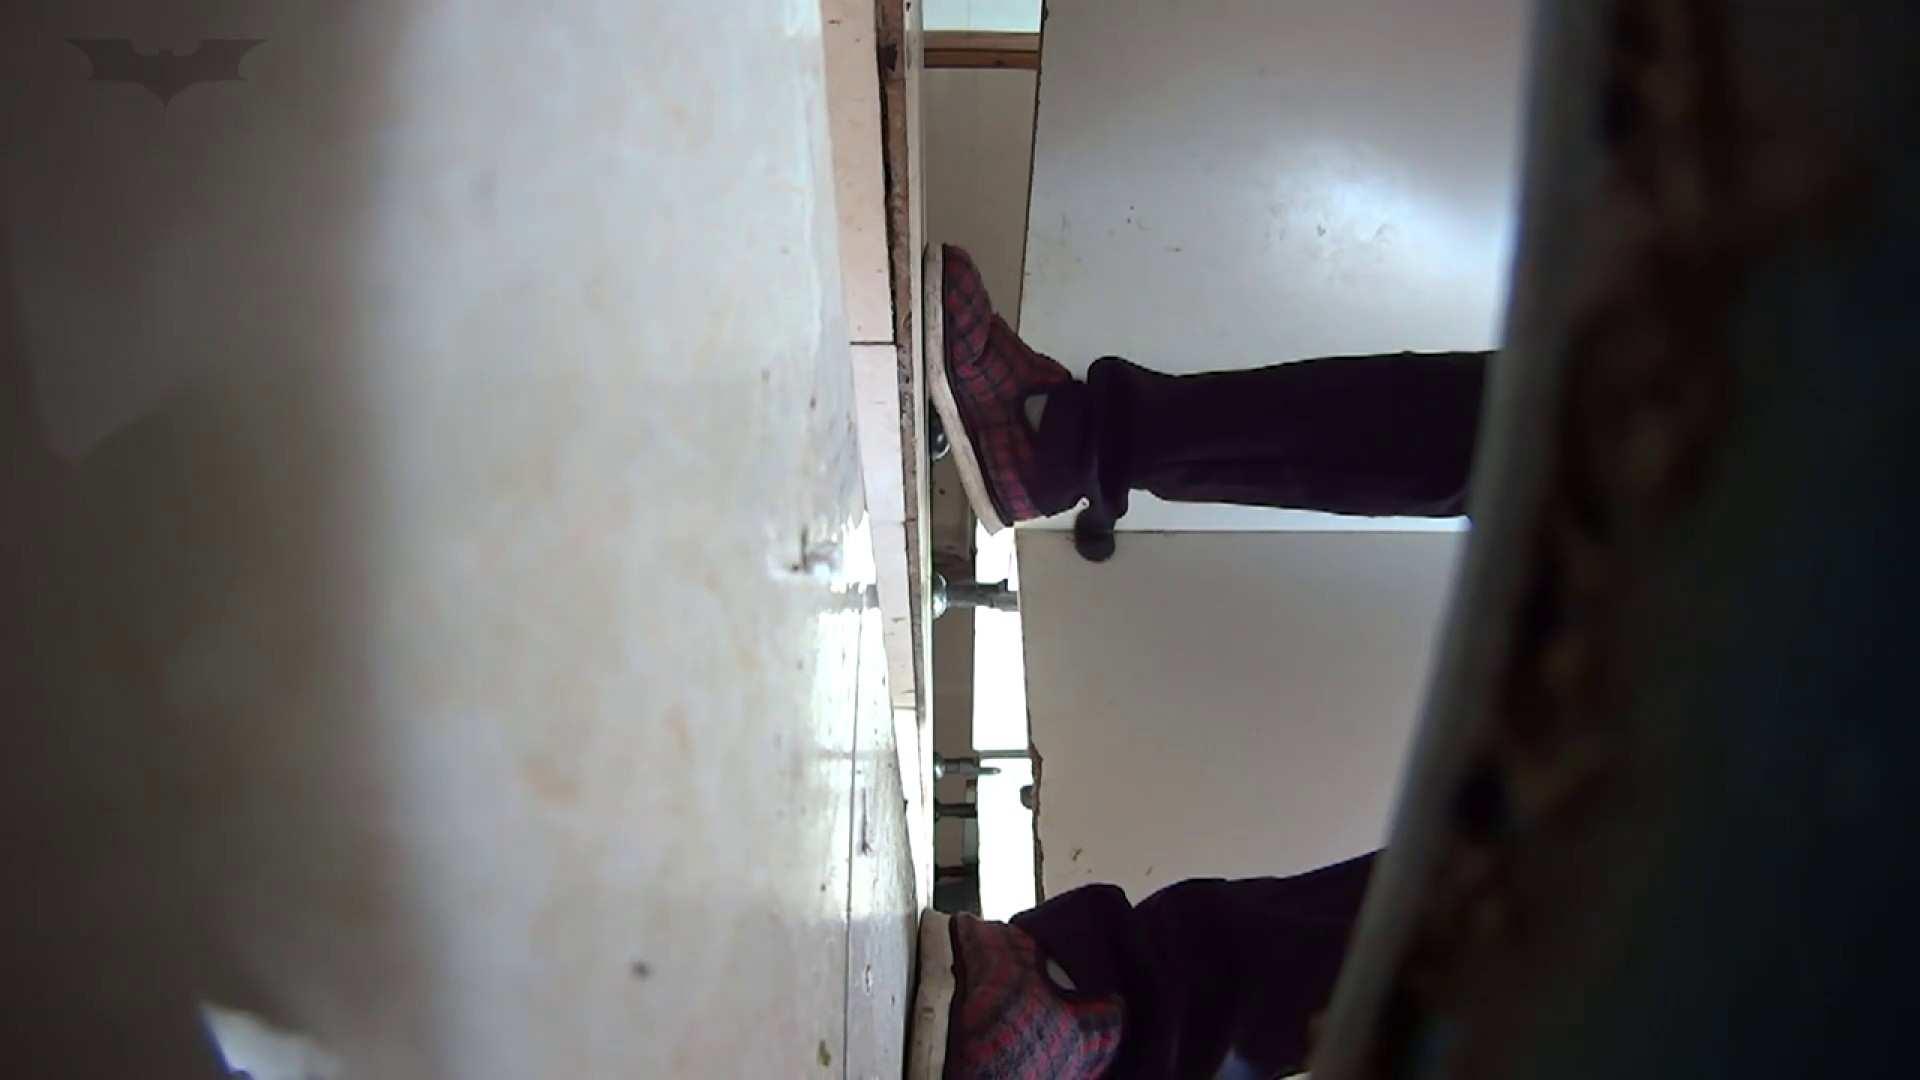 JD盗撮 美女の洗面所の秘密 Vol.40 盗撮 おまんこ無修正動画無料 68pic 28